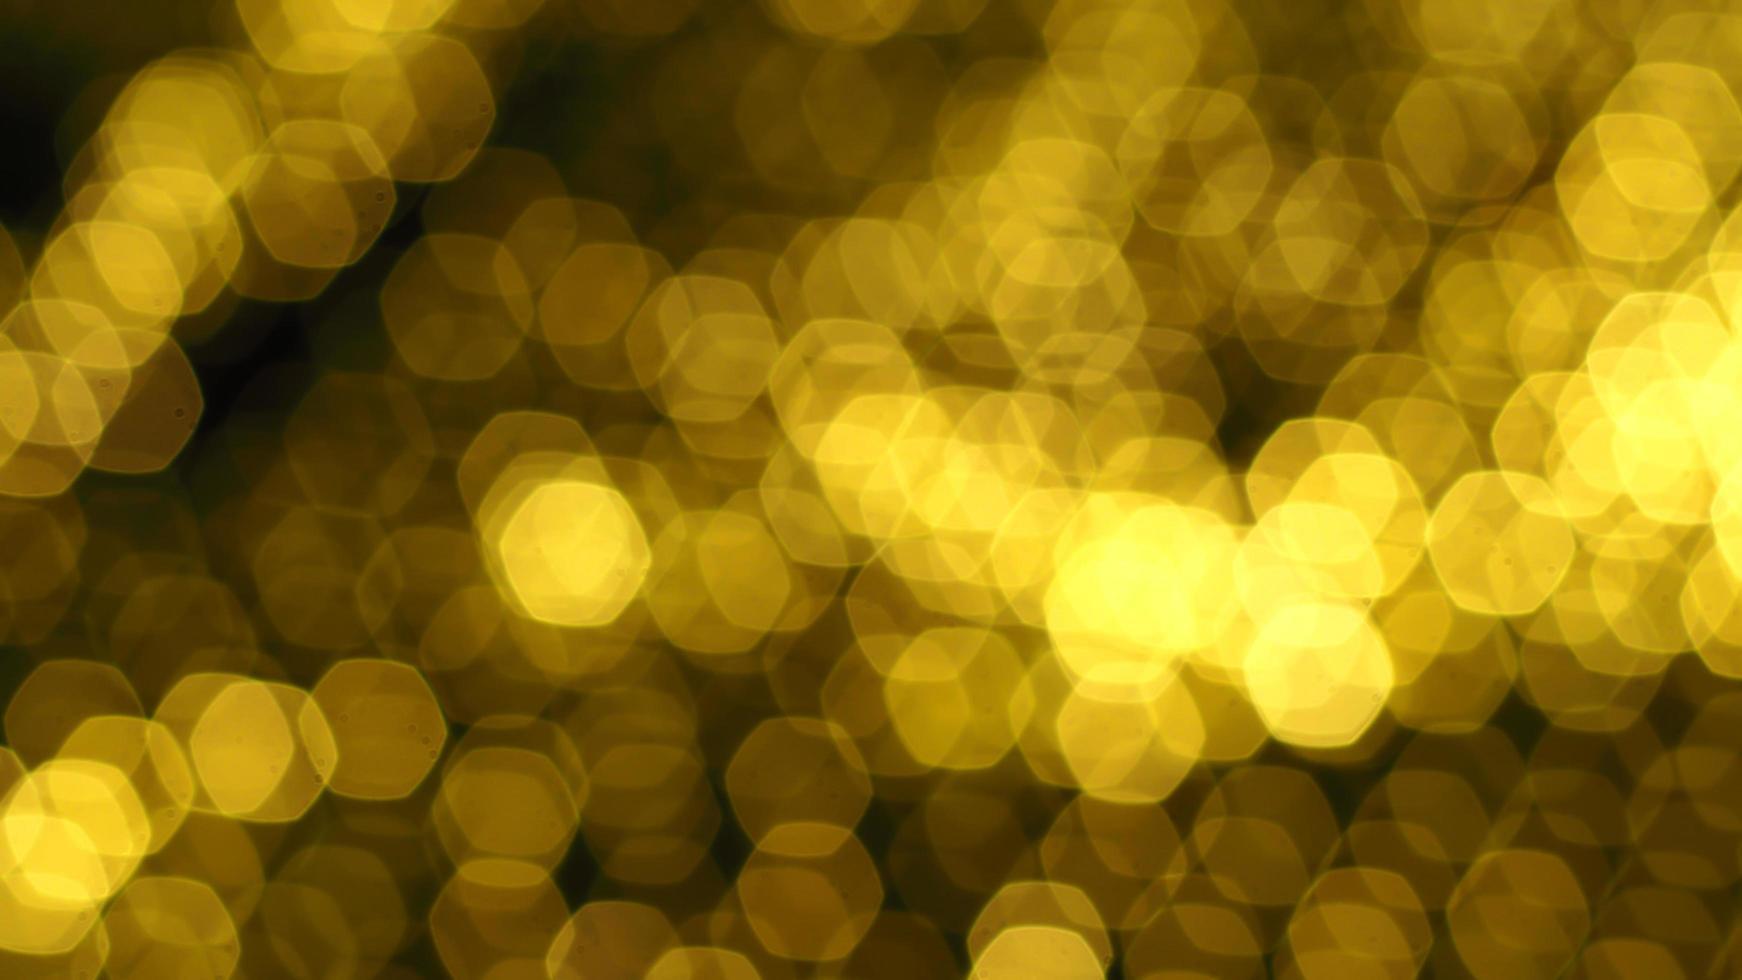 luz bokeh oro abstracto foto